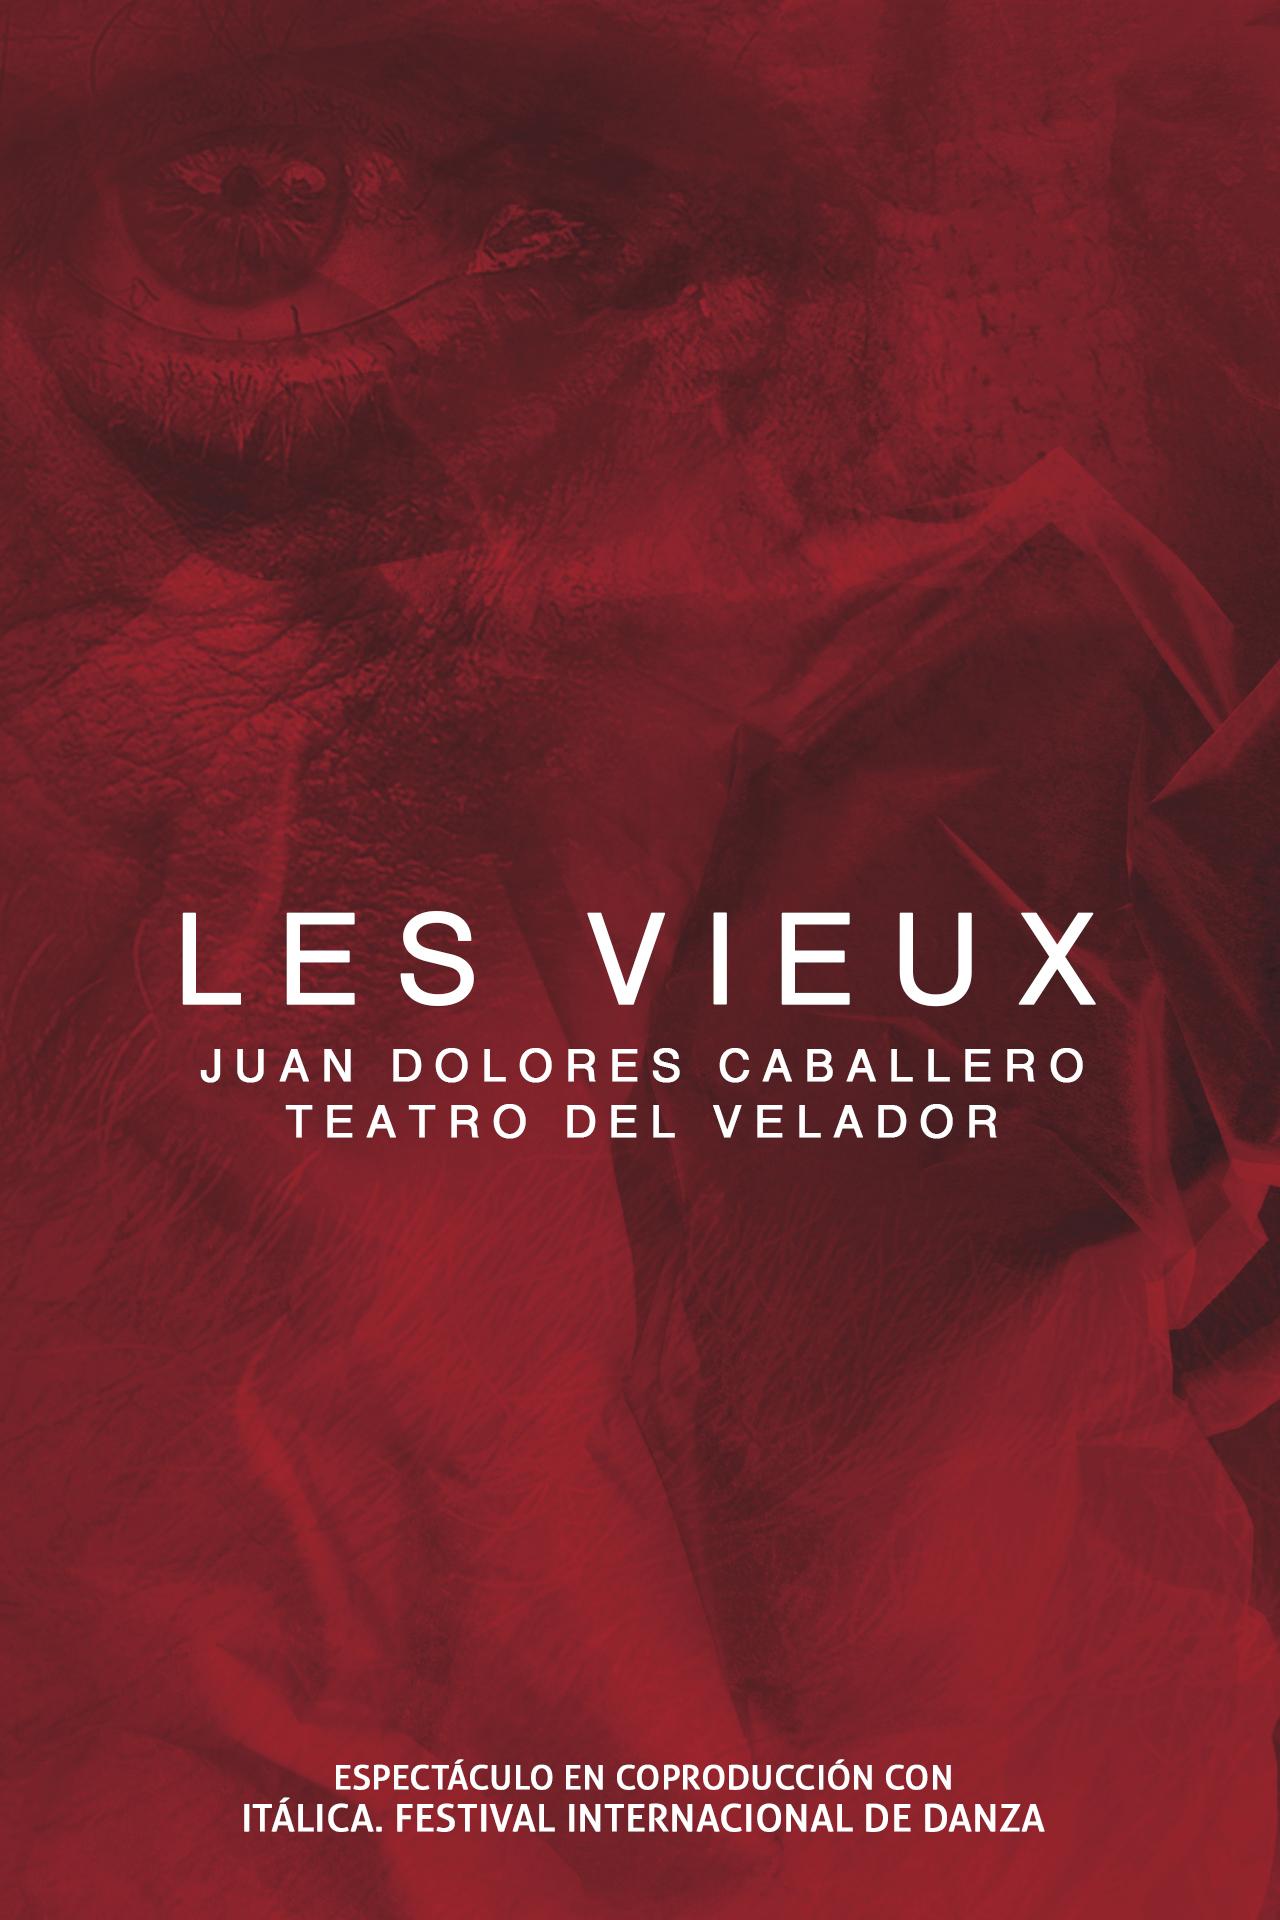 Teatro del Velador